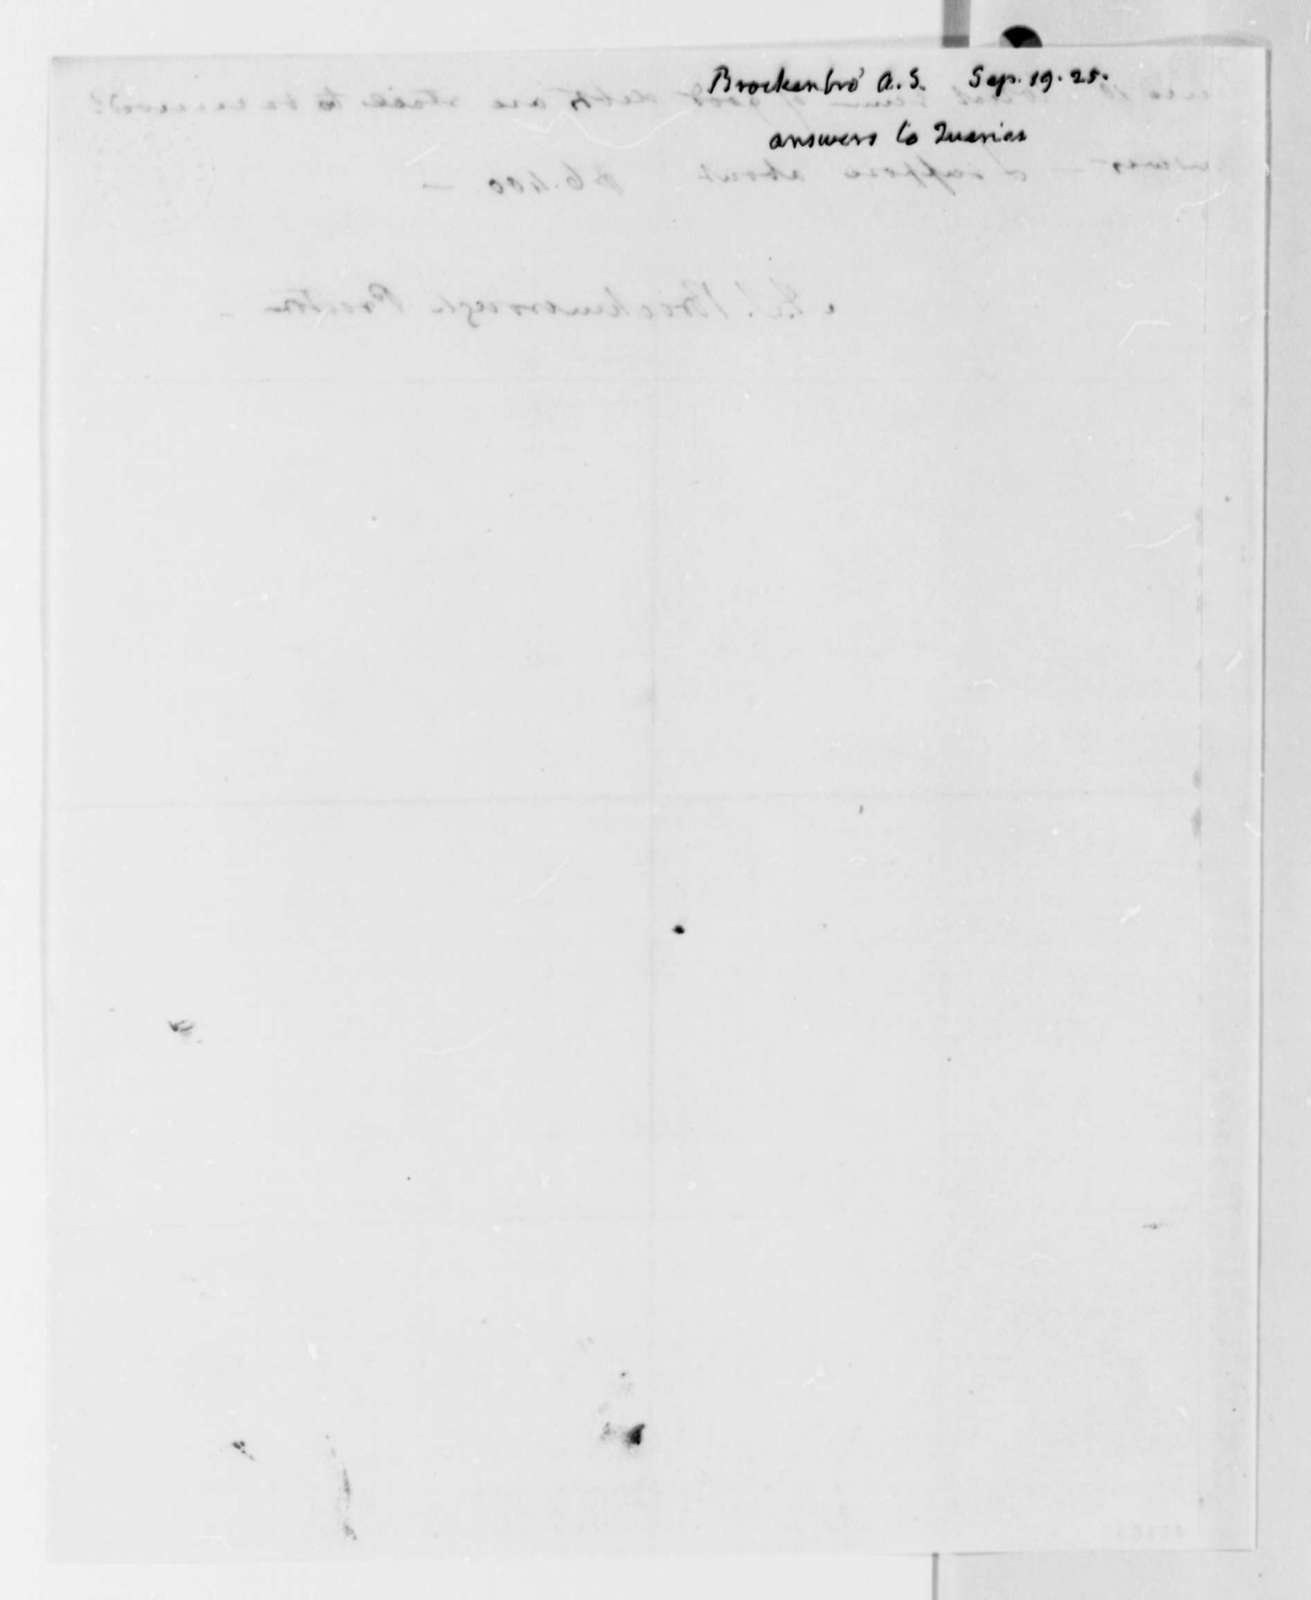 Arthur S. Brockenbrough, September 19, 1825, Queries on University of Virginia Expenses